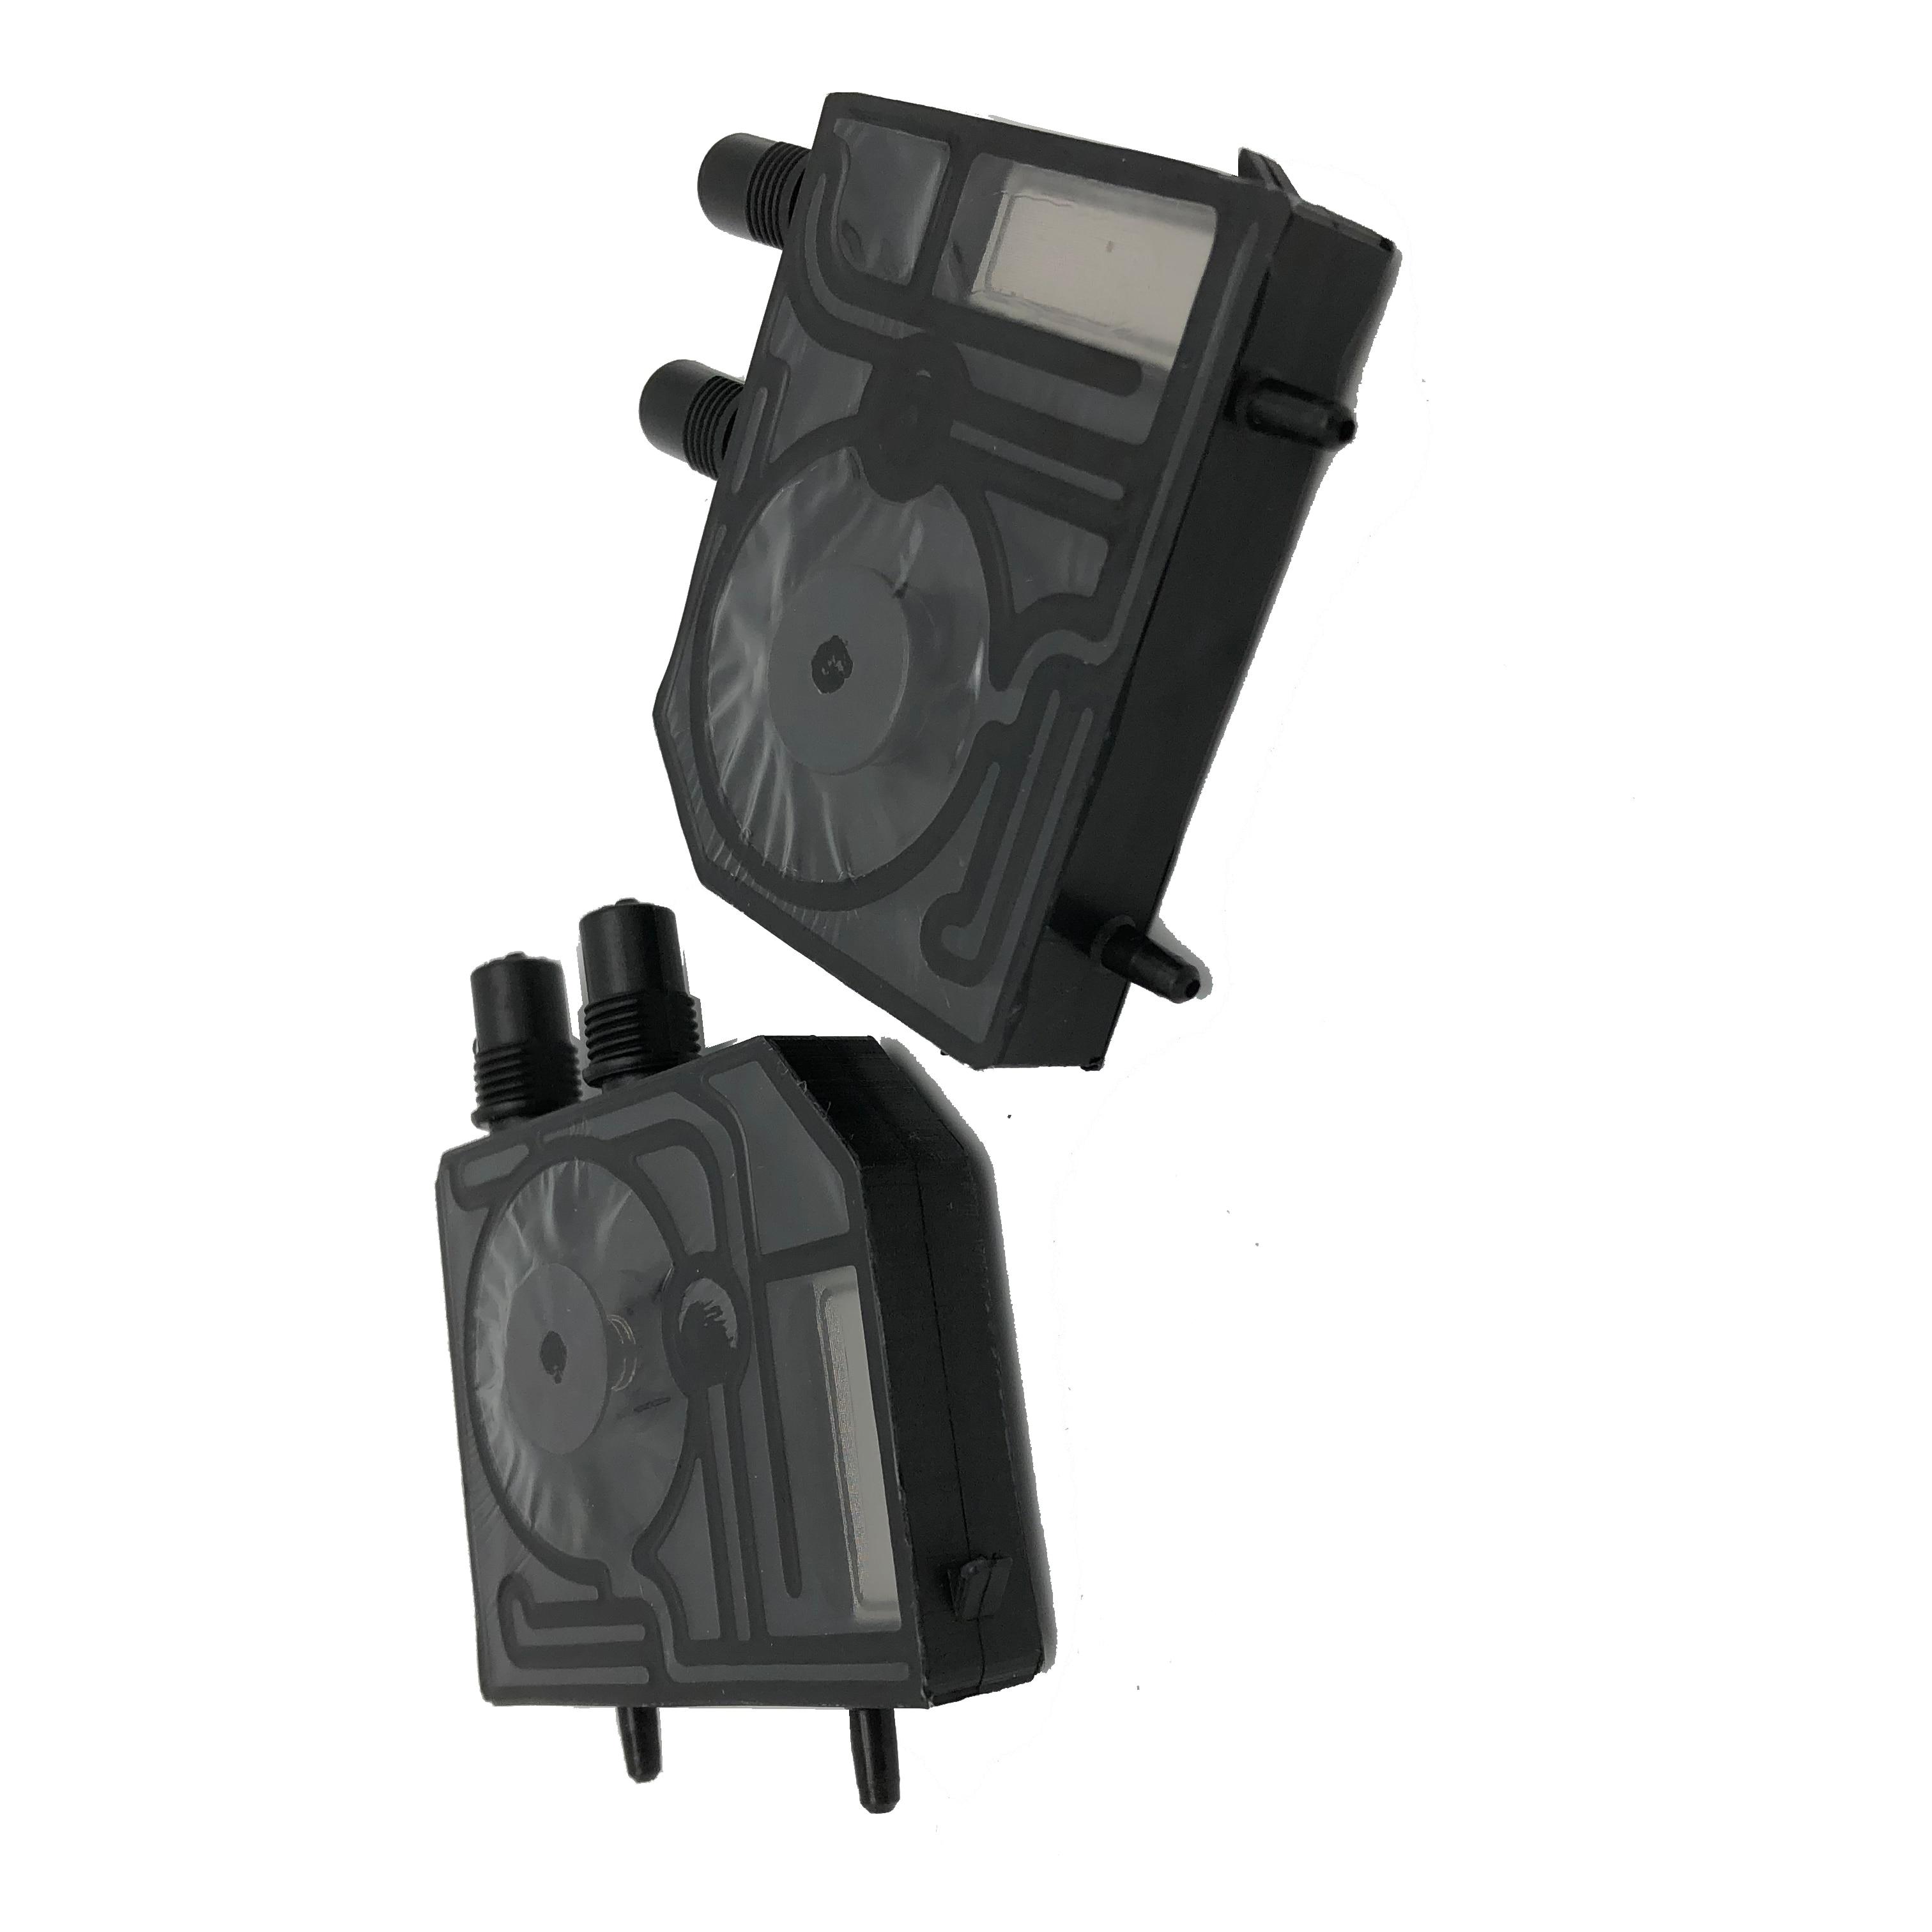 GEN4 GEN5 Cabeça de Impressão UV Ink Damper Para Mimaki 3042 UJF-3042 UJF-3042FX UJF-3042HG UJF-6042 impressora UV